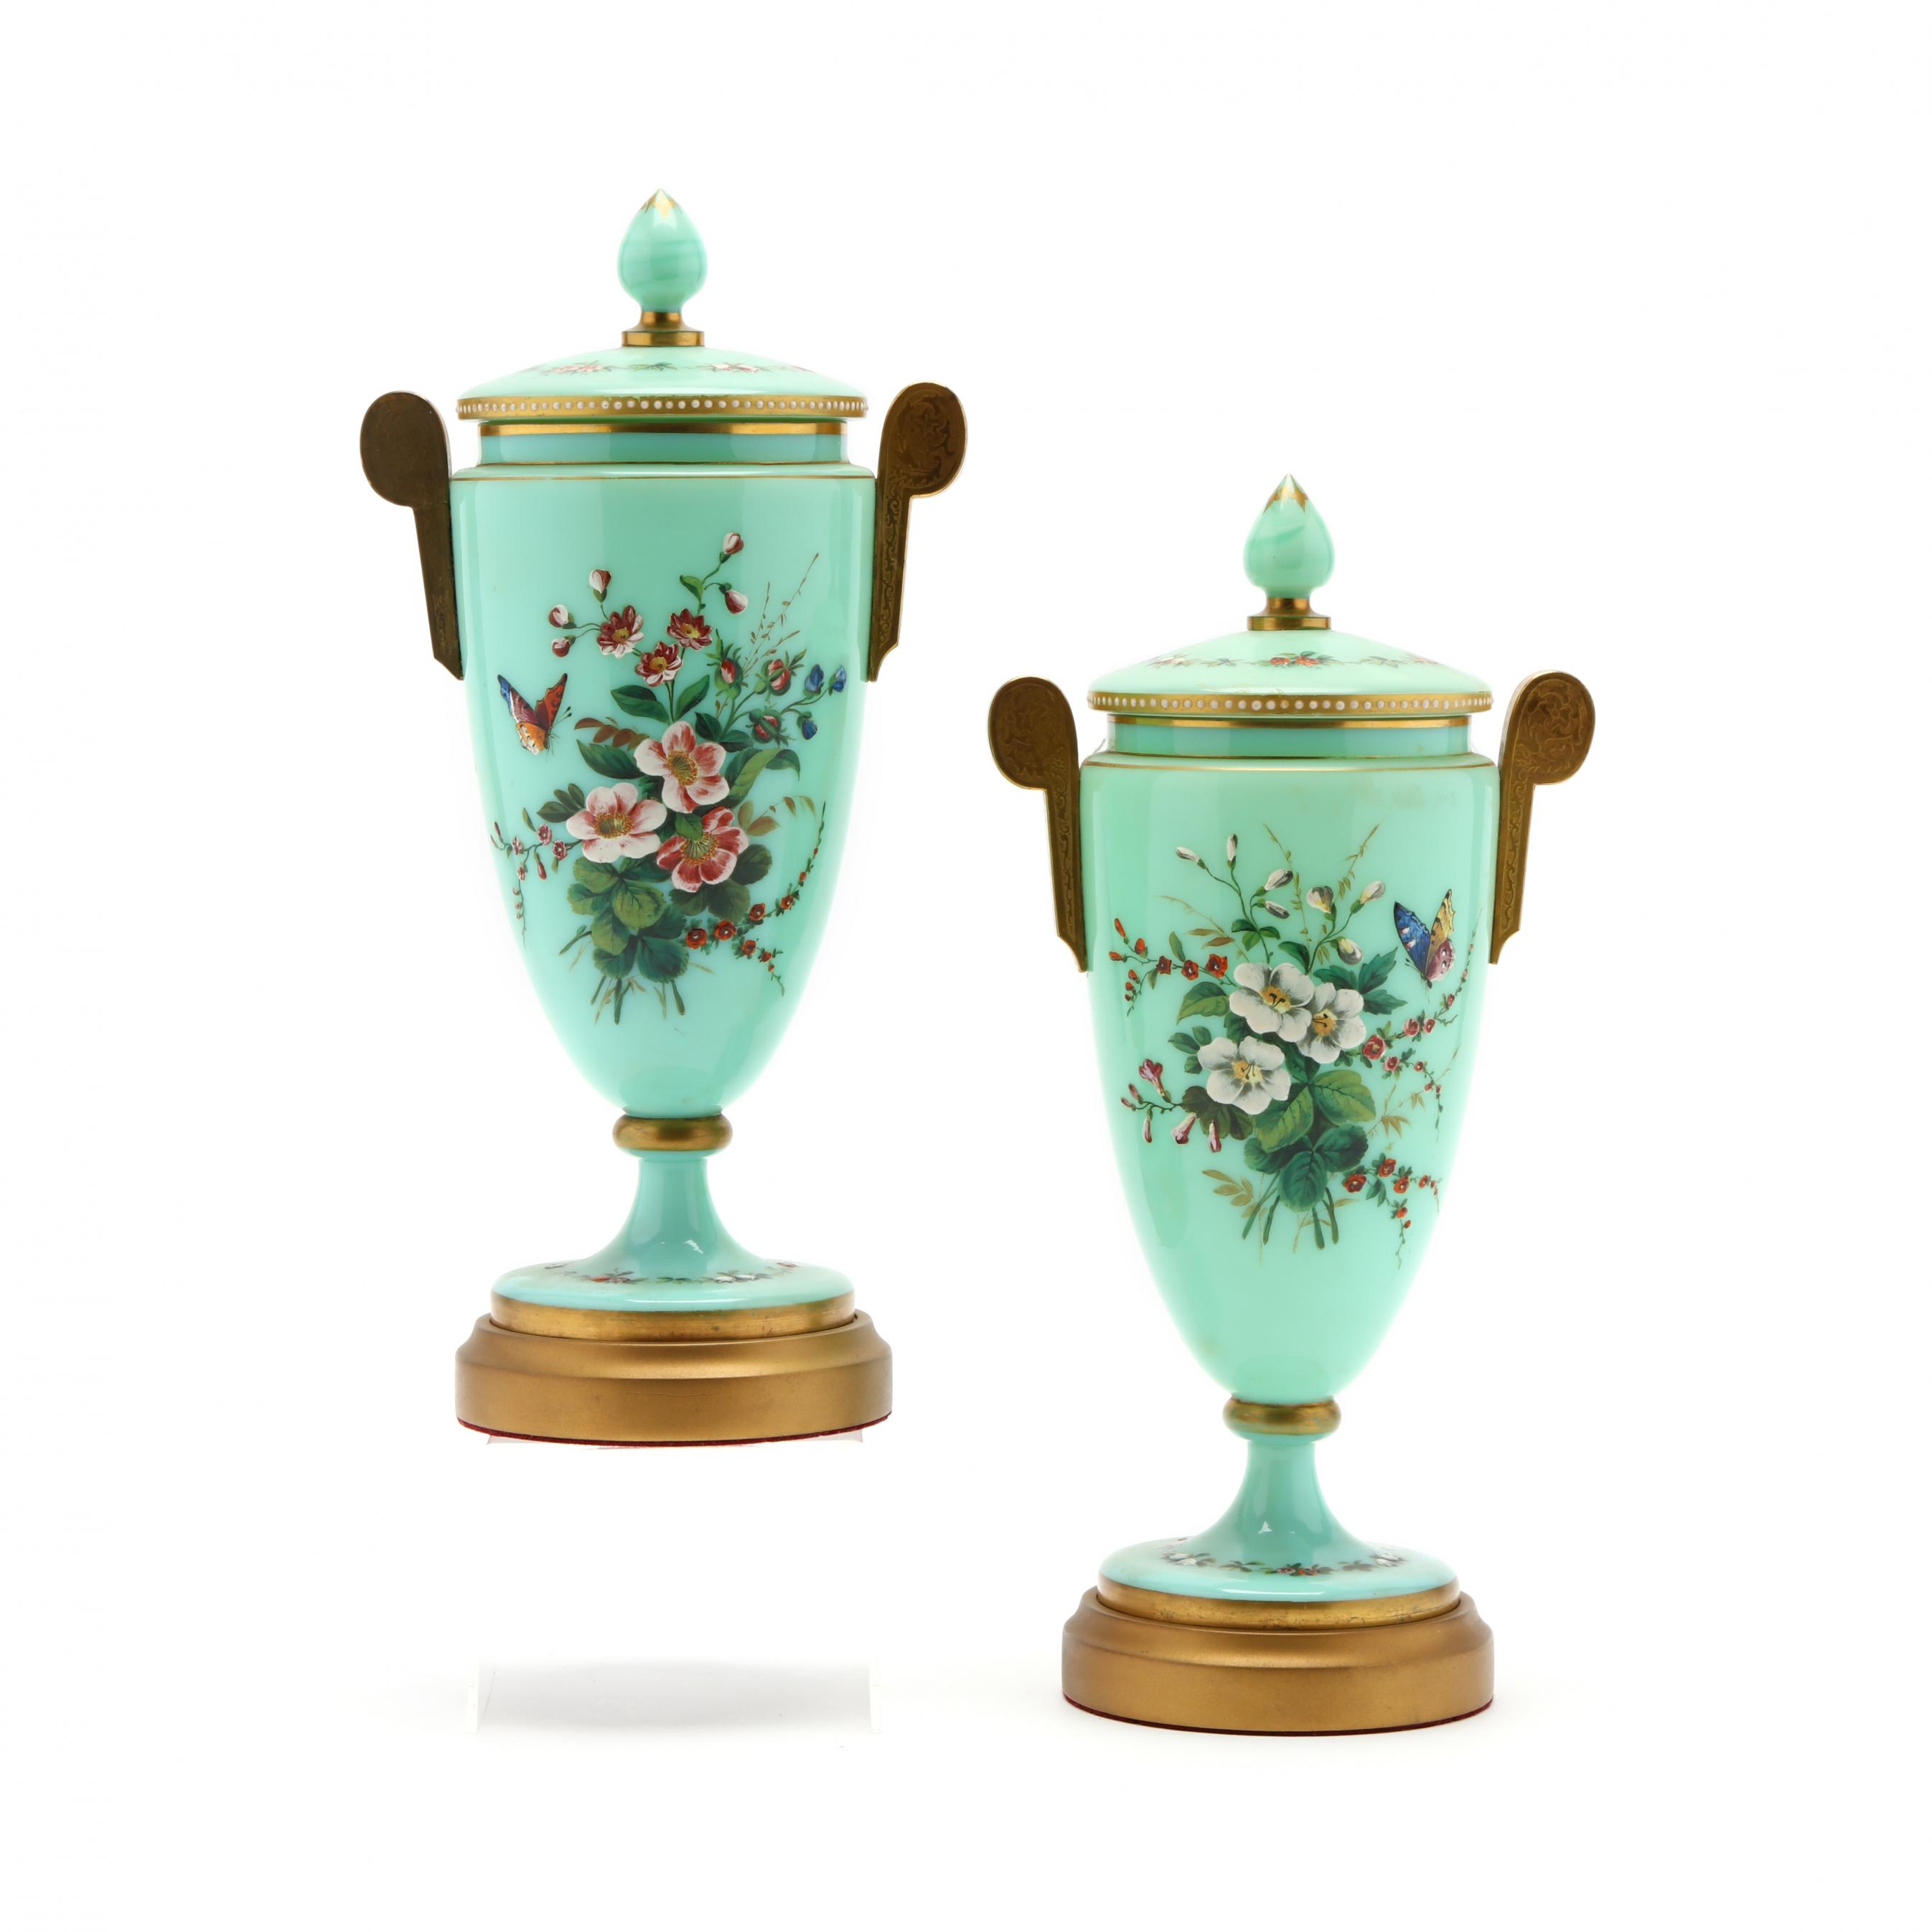 pair-of-antique-enameled-glass-lidded-urns